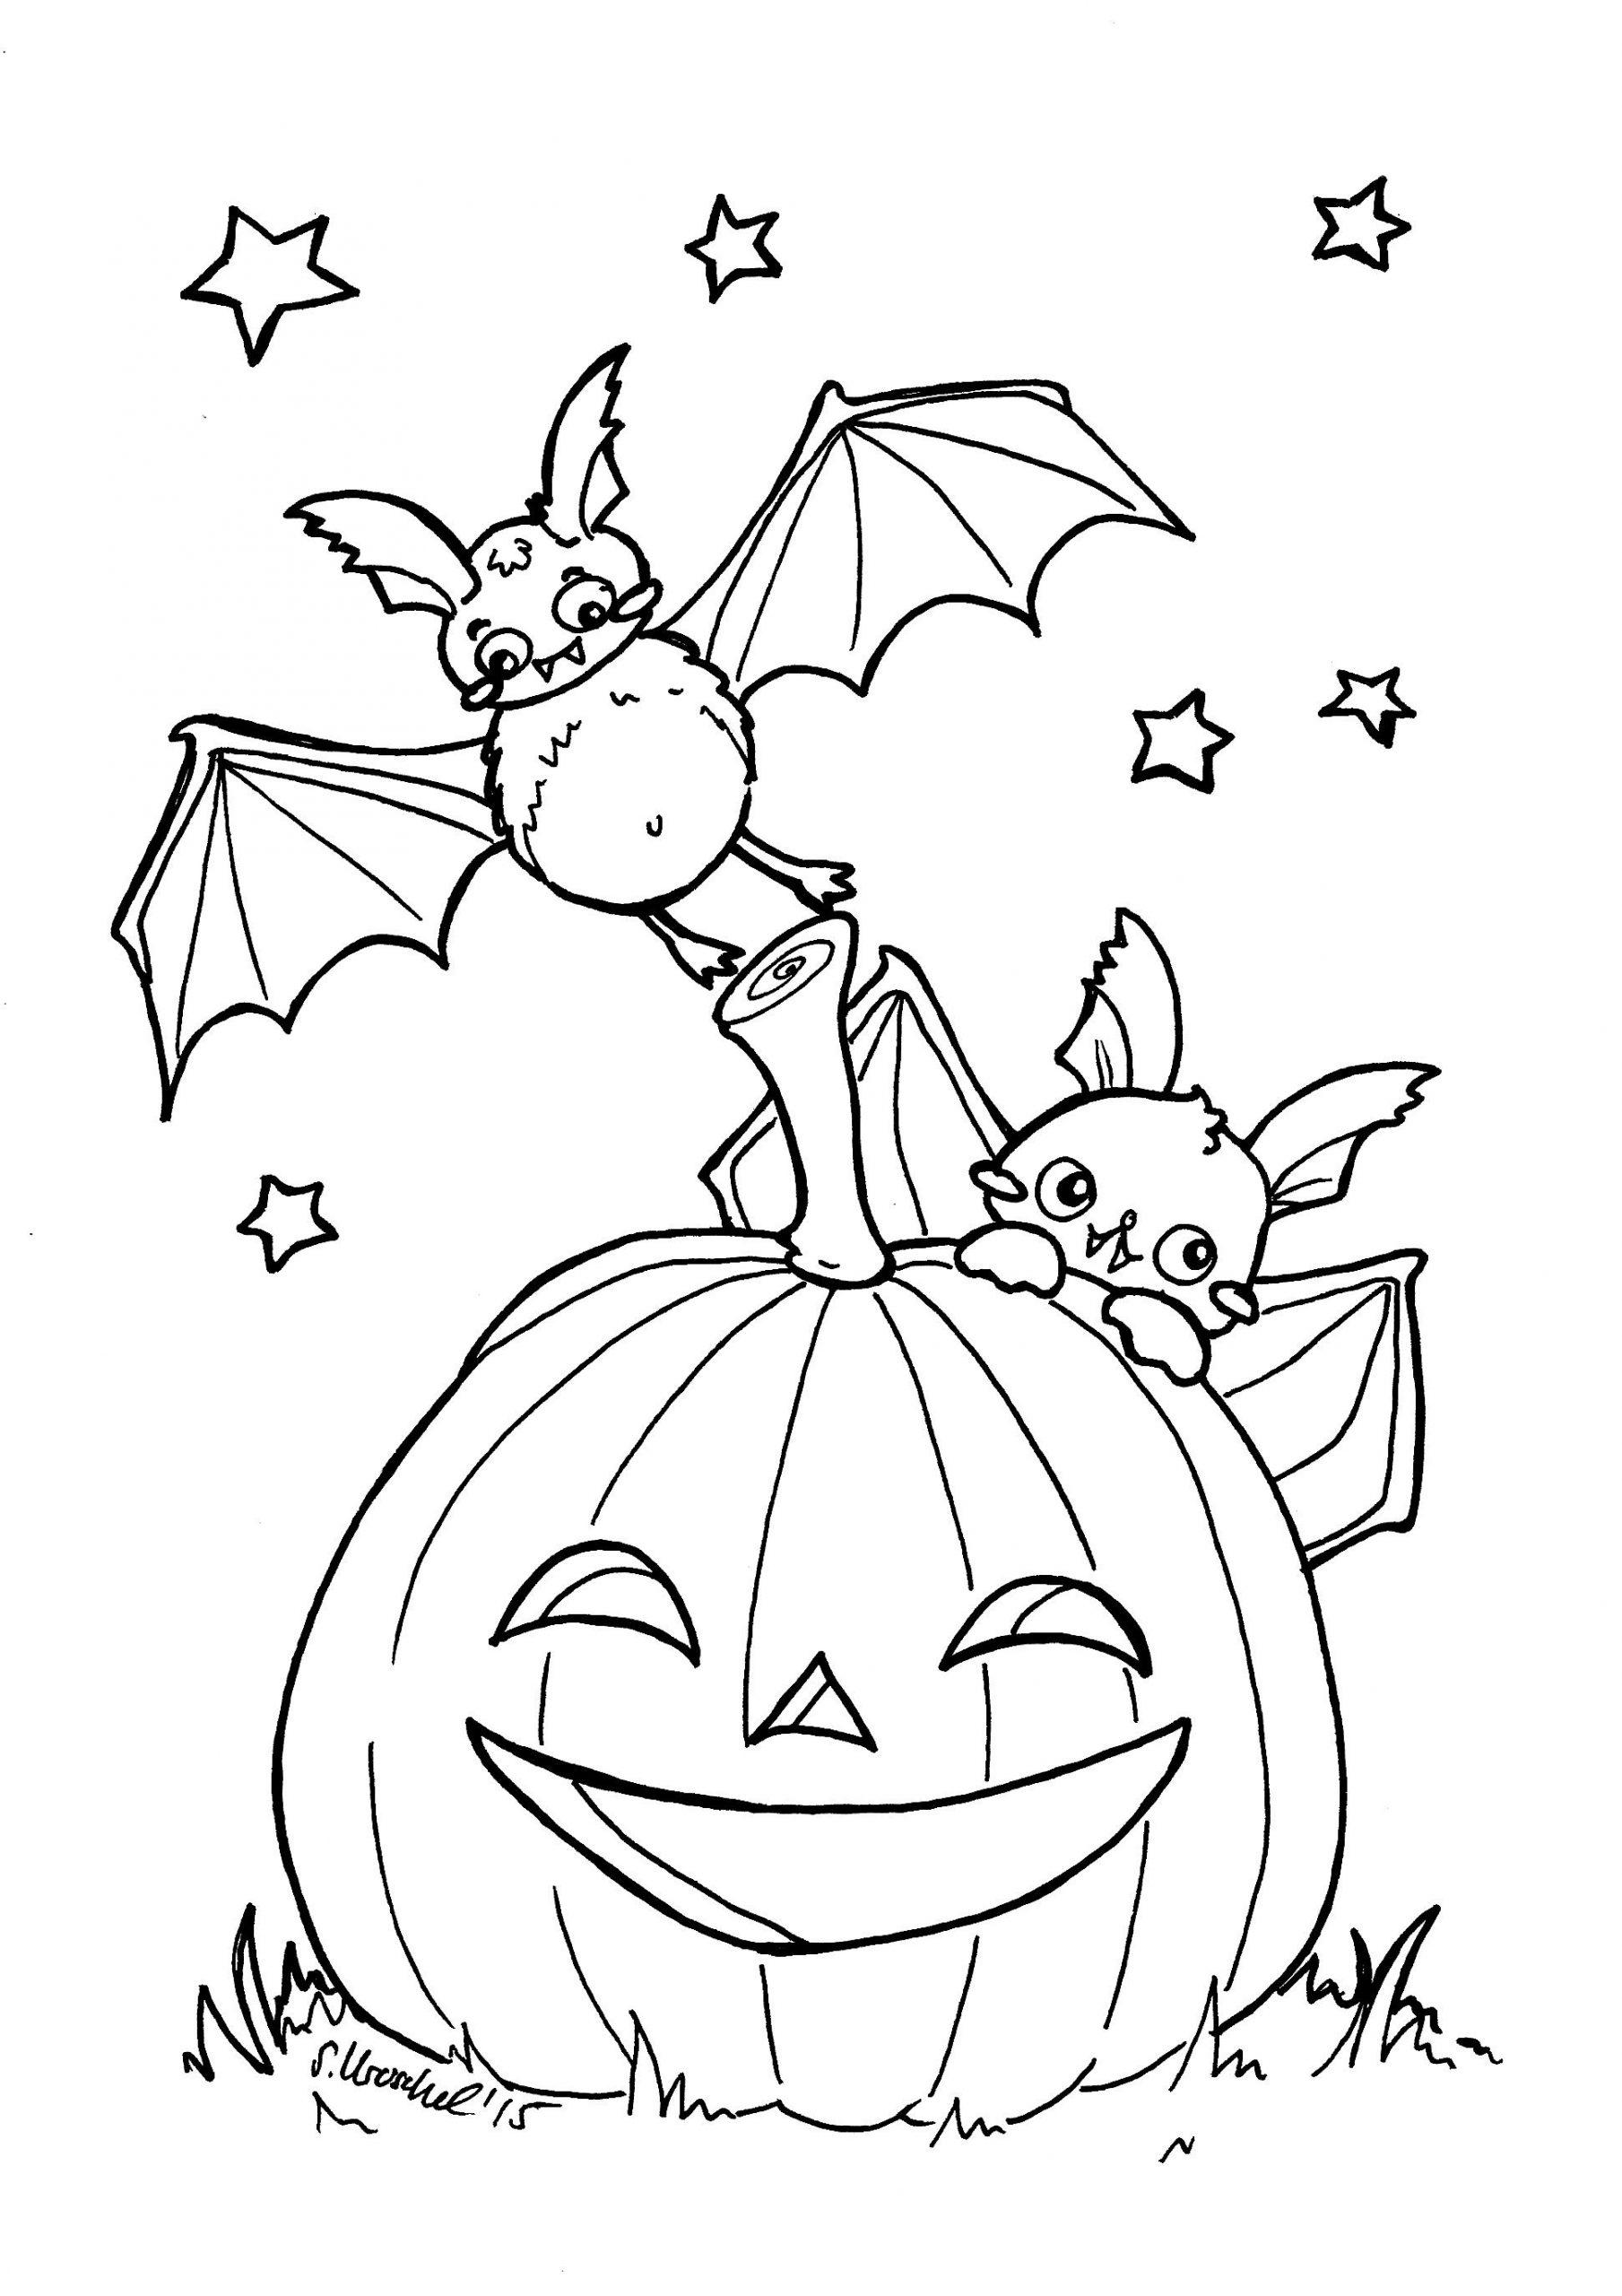 Ausmalbilder Oktober Halloween 938429348234 #color bestimmt für Gruselige Halloween Ausmalbilder Zum Ausdrucken